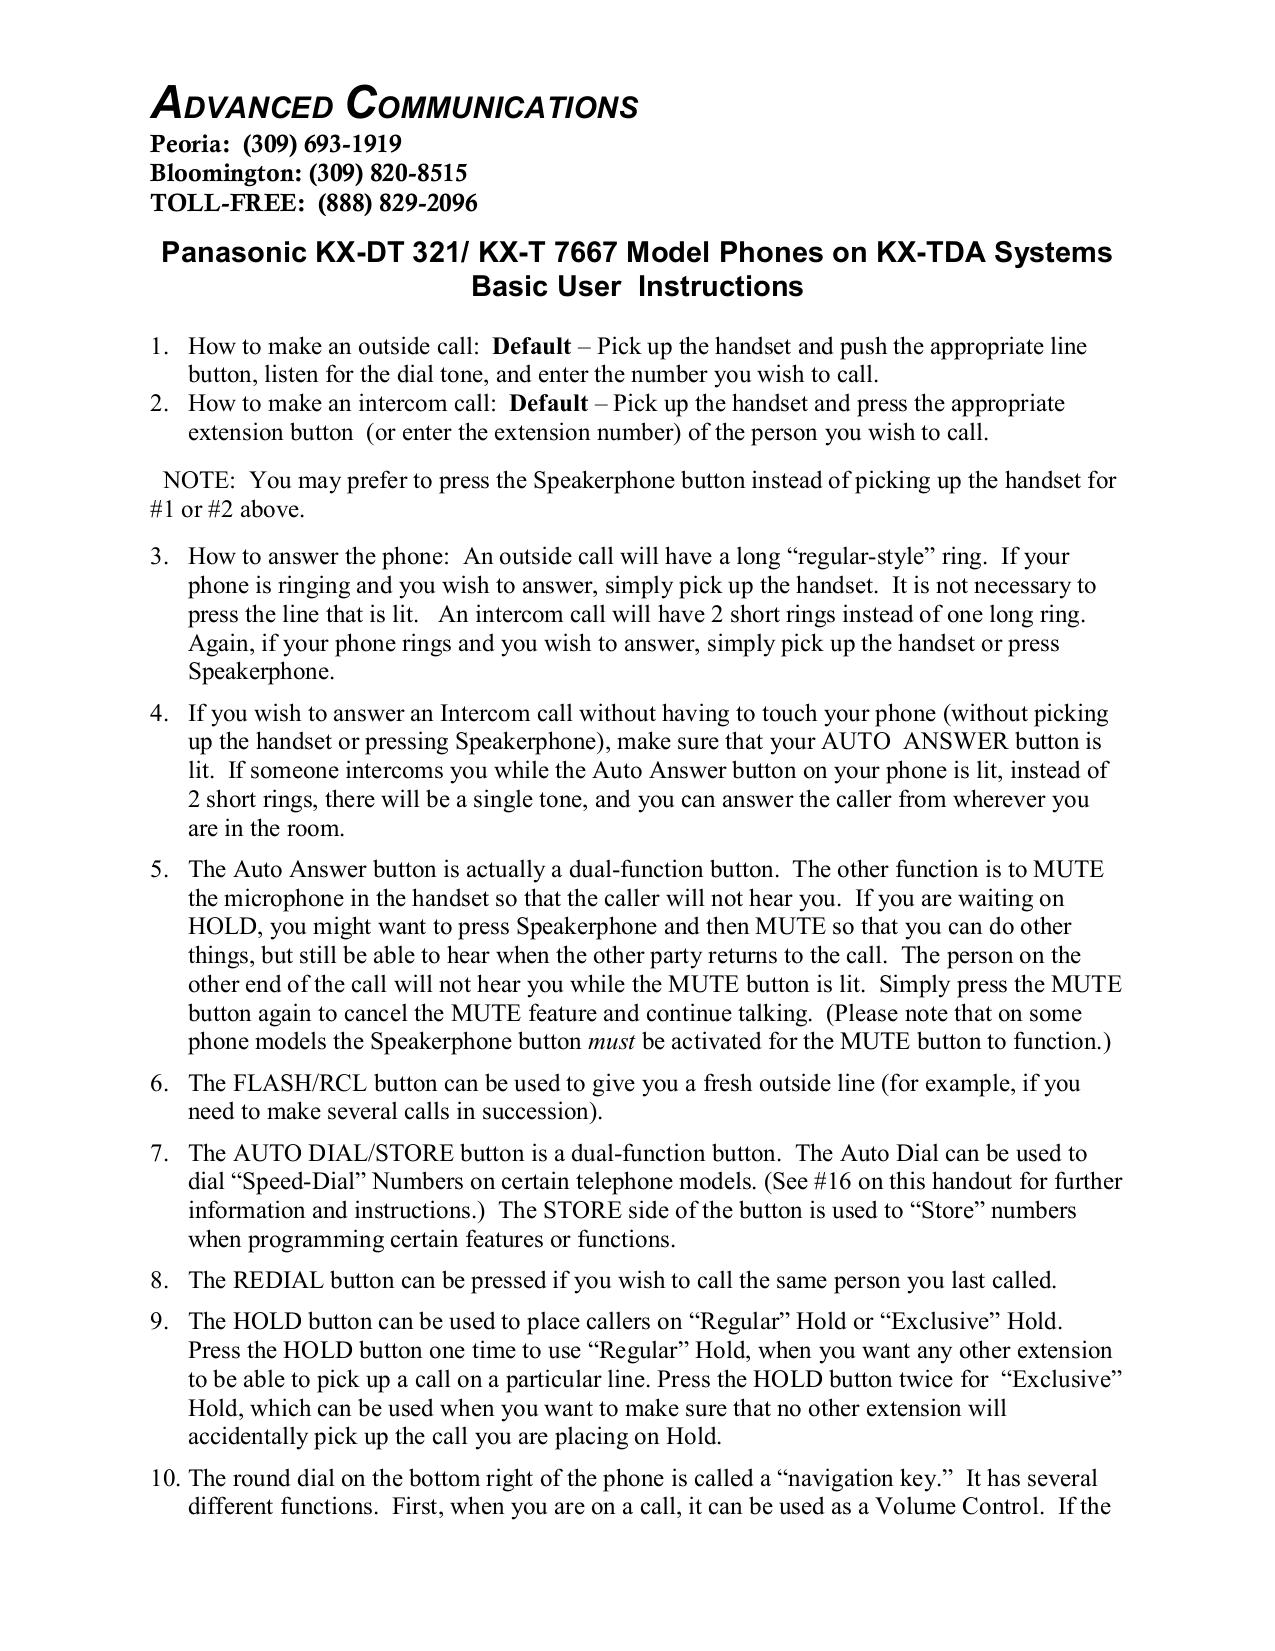 download free pdf for panasonic kx t7667 telephone manual rh umlib com Panasonic Phone Model Kx-Tgd560 Manual panasonic kx-t7667 instruction manual